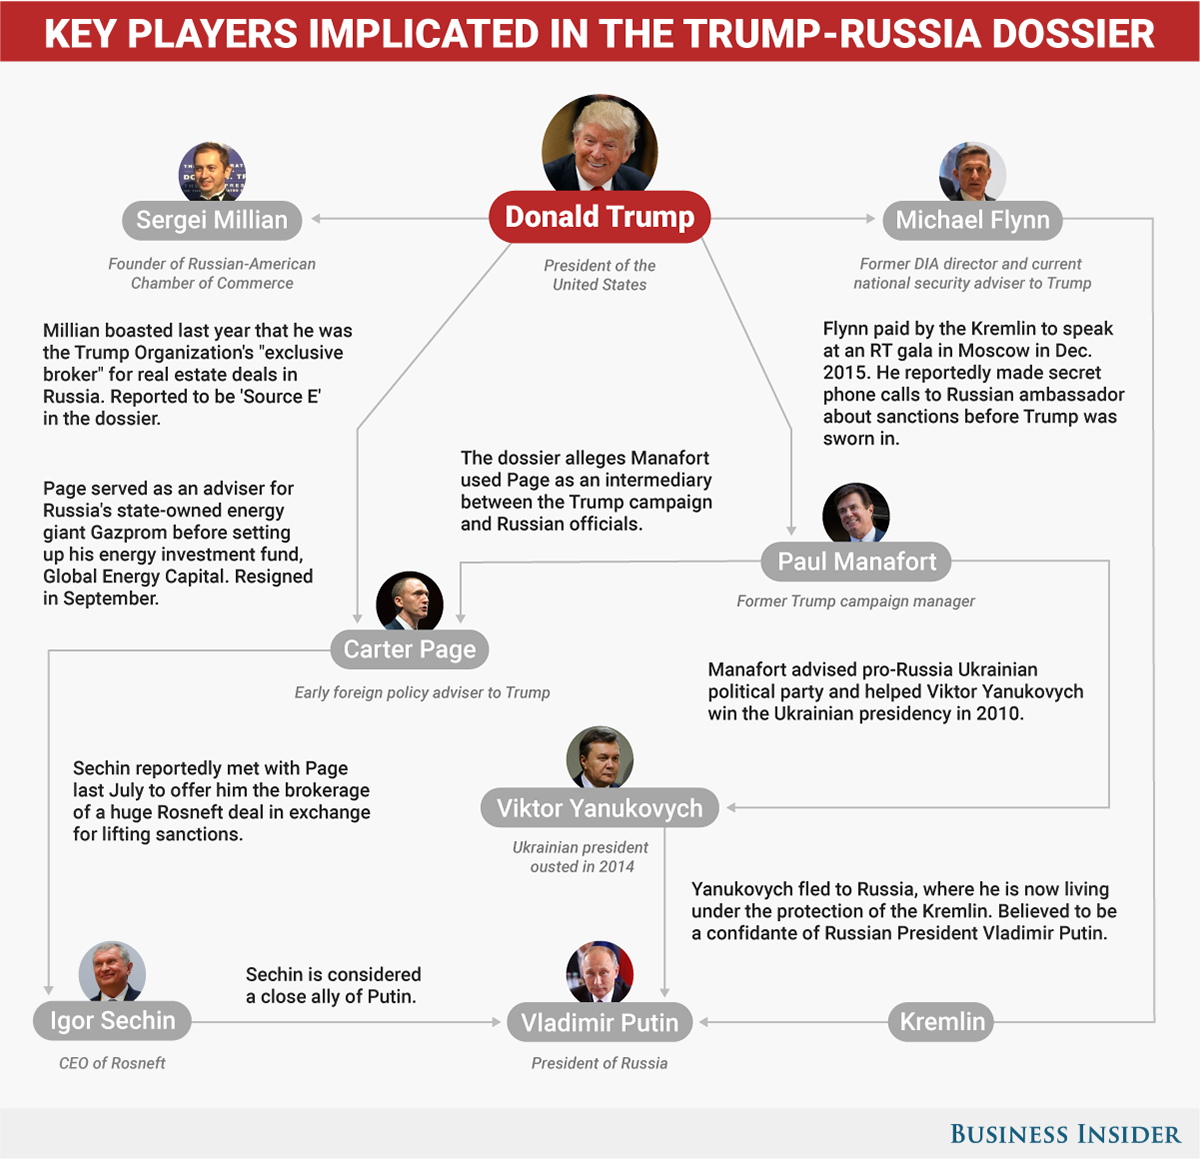 Donald Trump's ties to Russia